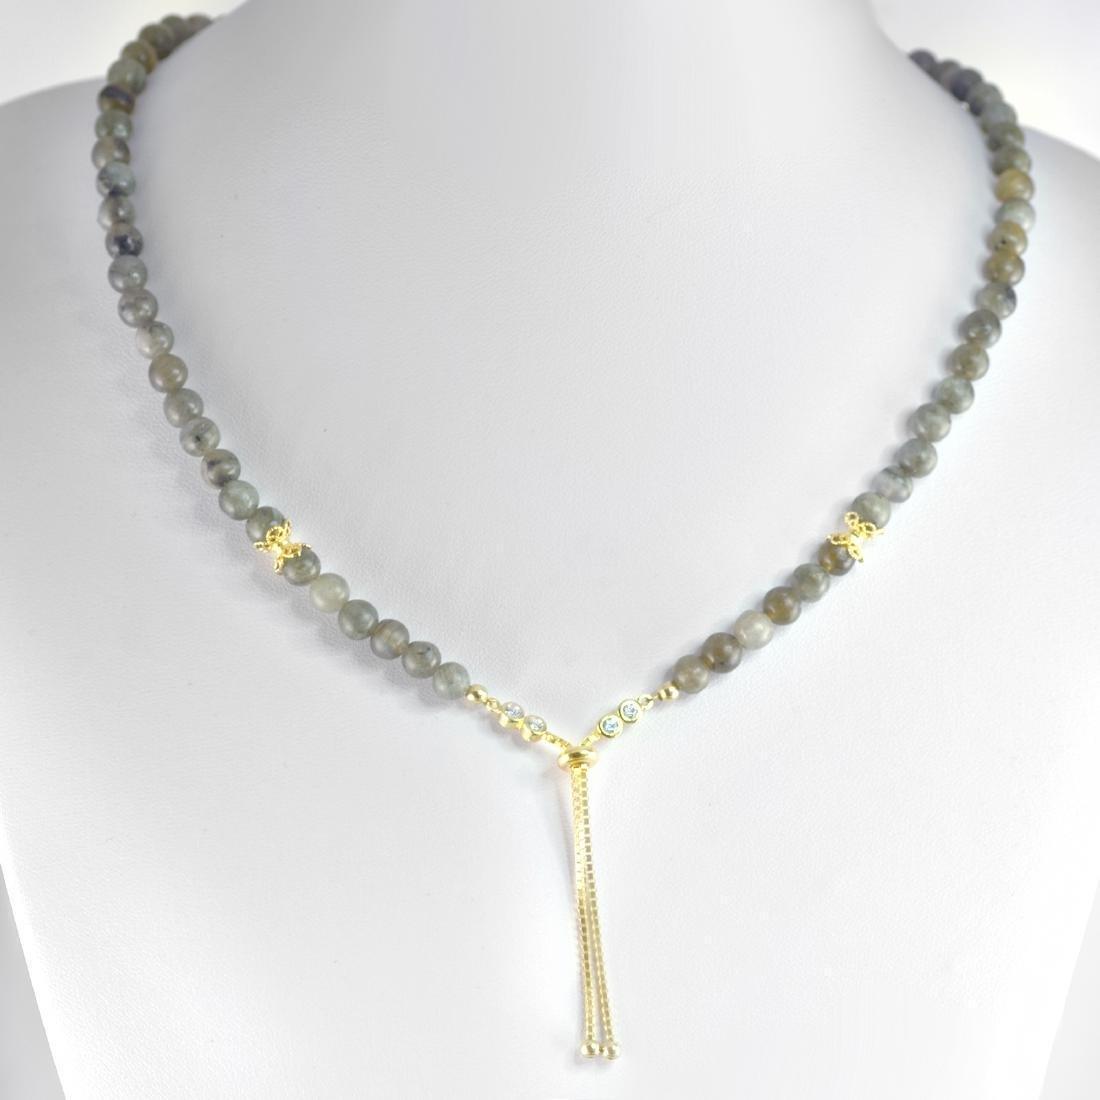 Norwegian Labradorite Adjustable Necklace